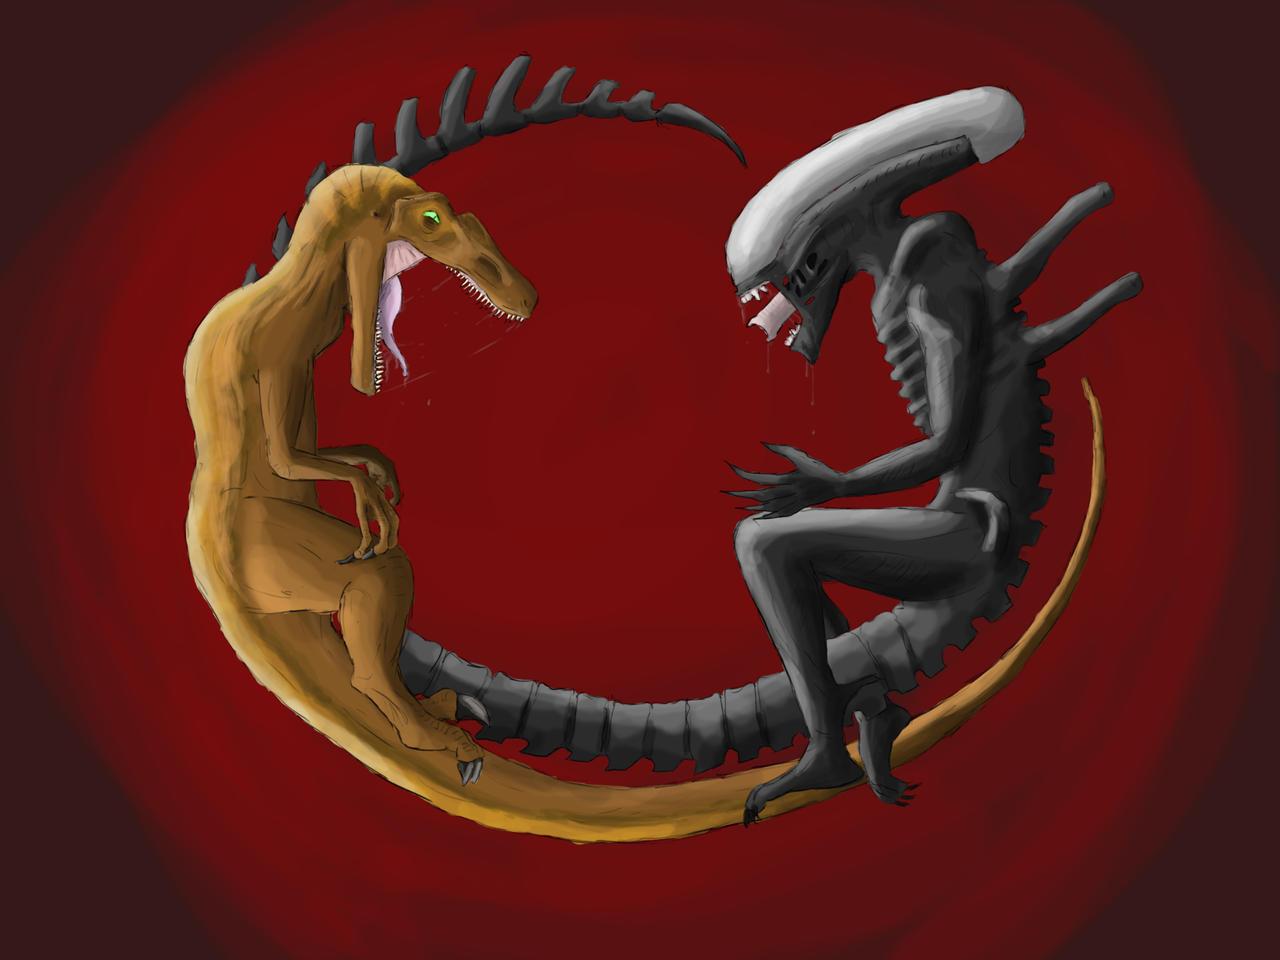 Alien vs Raptor by Thorex on DeviantArt